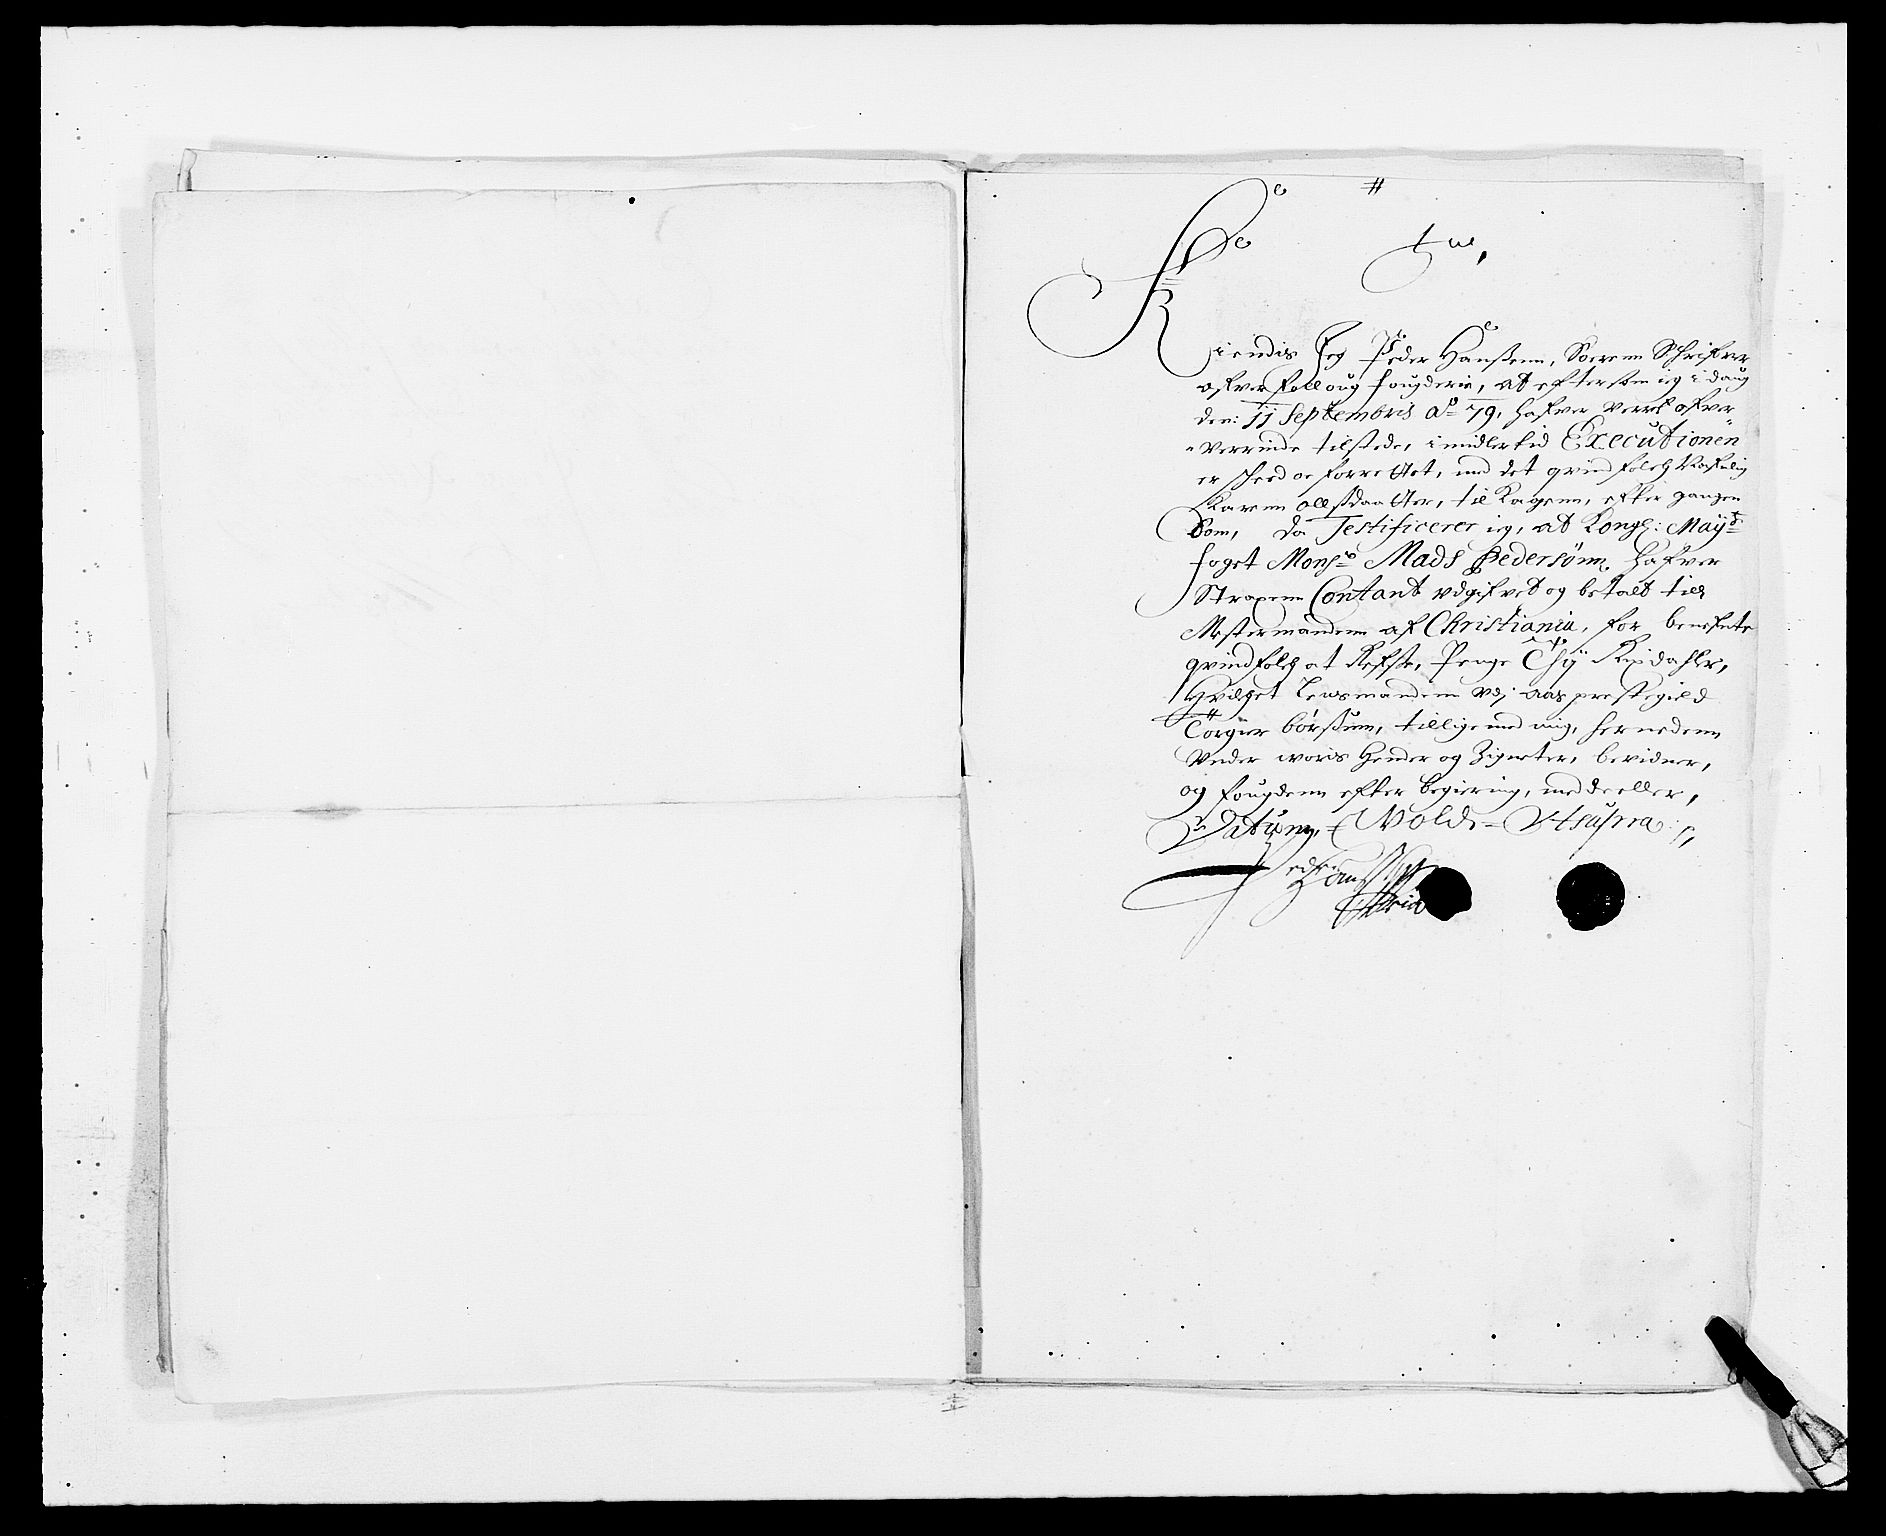 RA, Rentekammeret inntil 1814, Reviderte regnskaper, Fogderegnskap, R09/L0427: Fogderegnskap Follo, 1678, s. 252